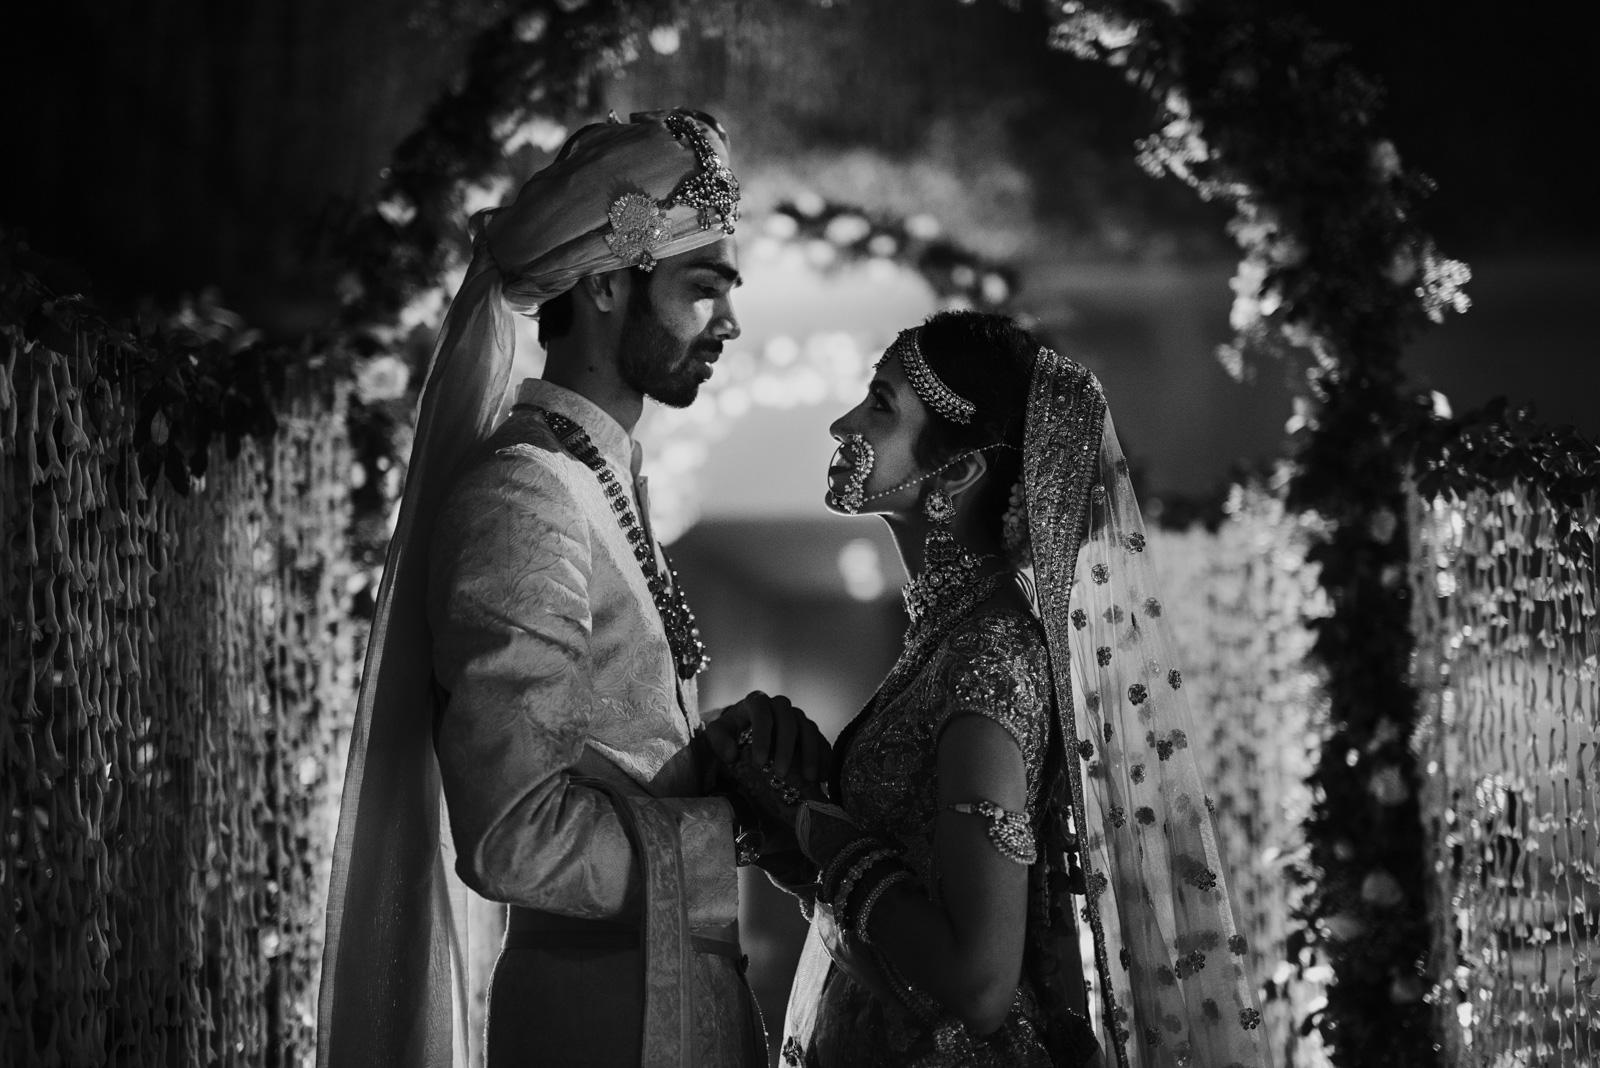 wedding in india - destination wedding photographer.jpg